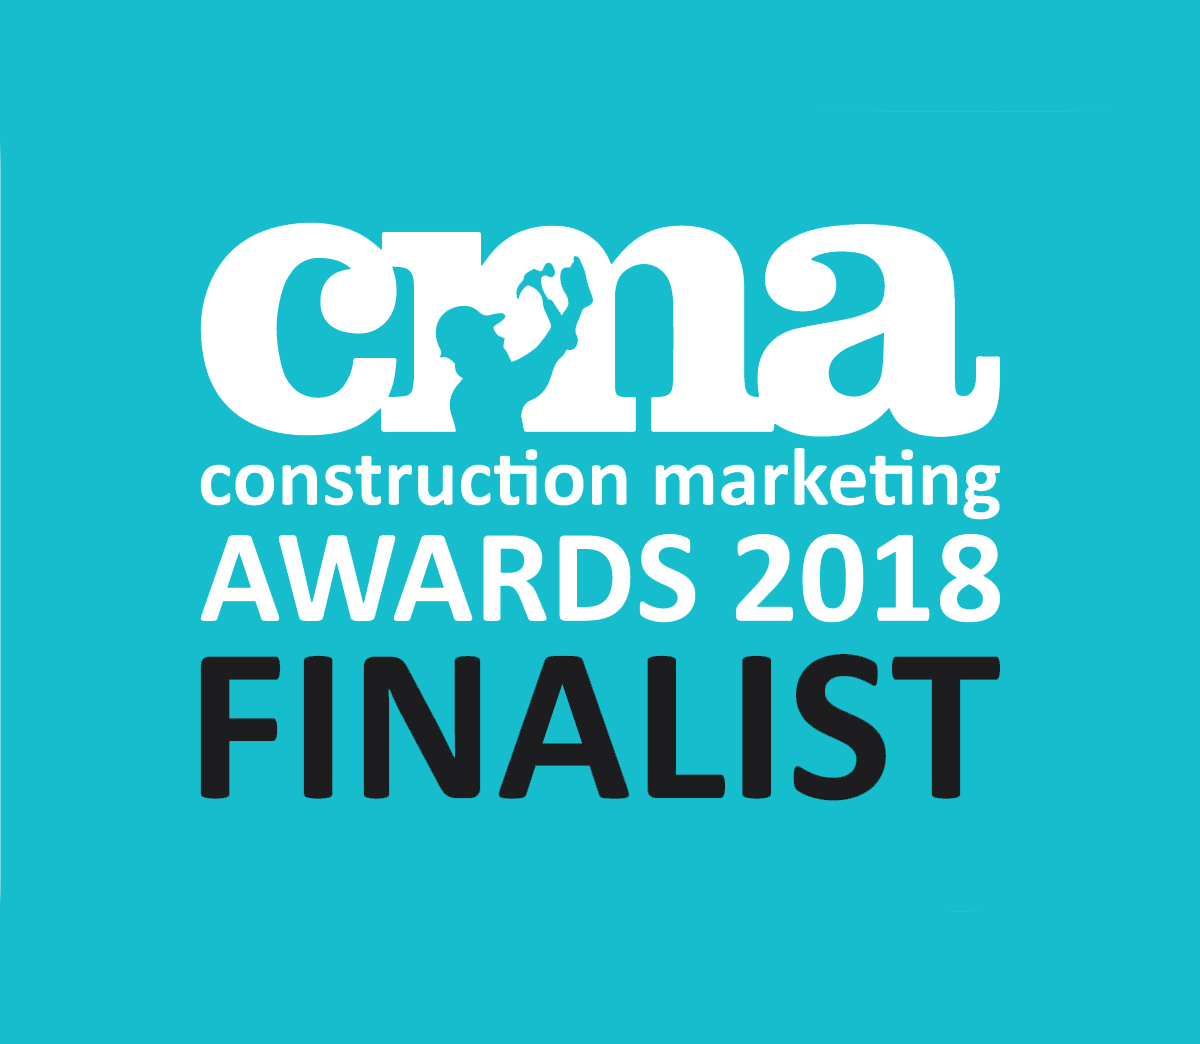 construction marketing finalist